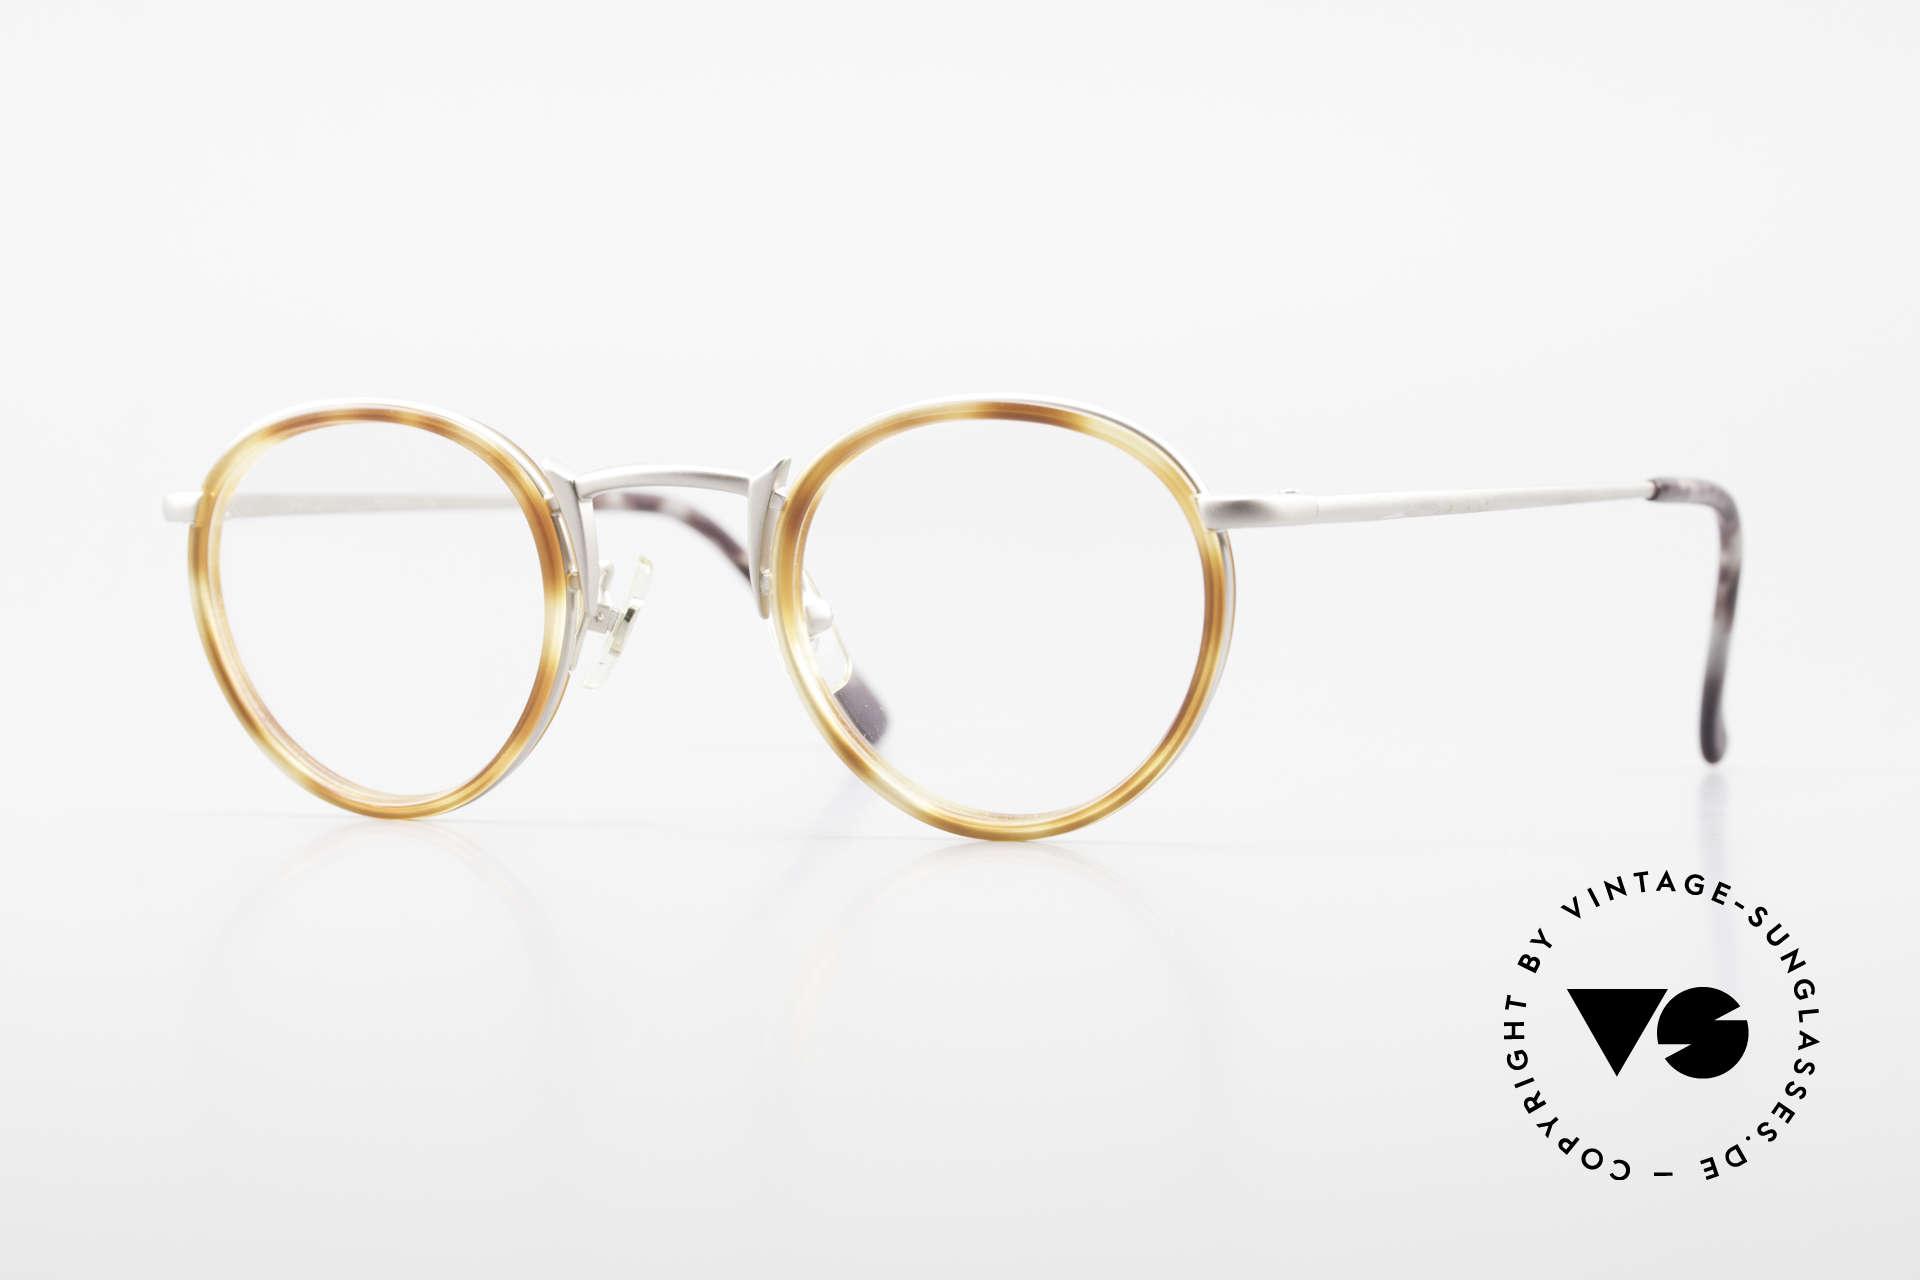 Freudenhaus Bido Round 90's Designer Frame, vintage designer glasses by FREUDENHAUS, Munich, Made for Men and Women